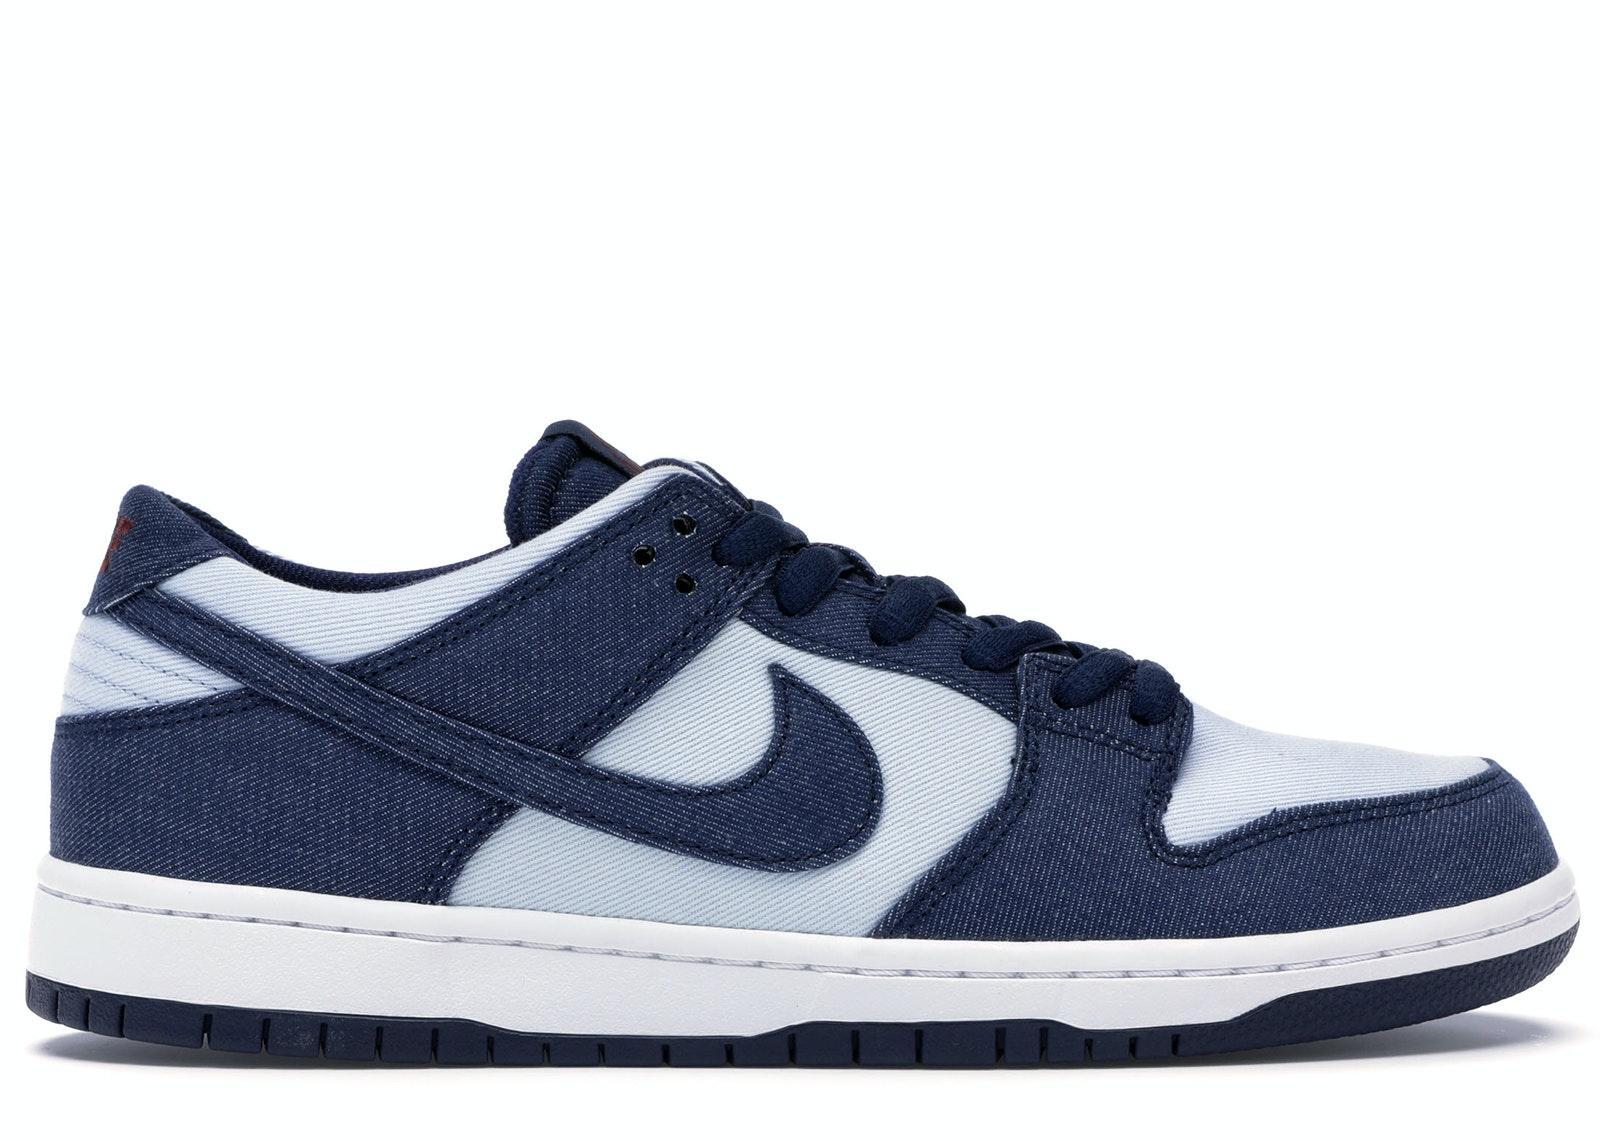 Nike SB Dunk Low Binary Blue